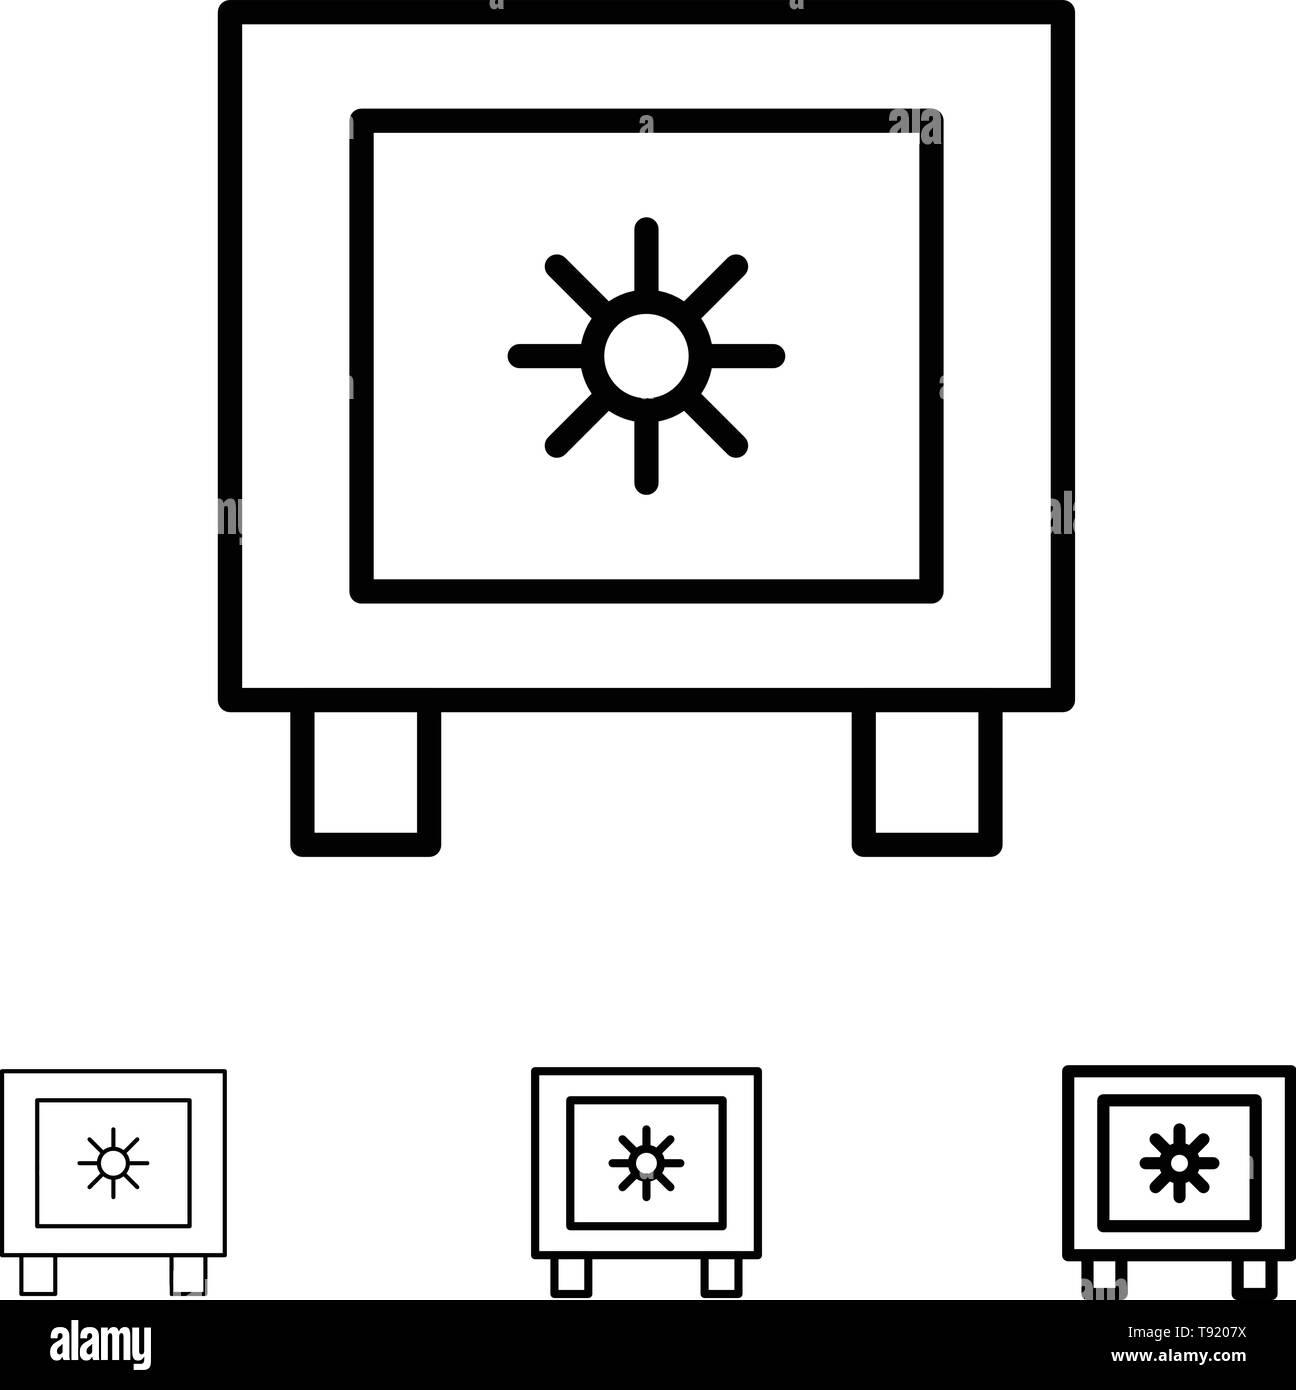 Locker, Lock, Global, Logistic Bold and thin black line icon set - Stock Image